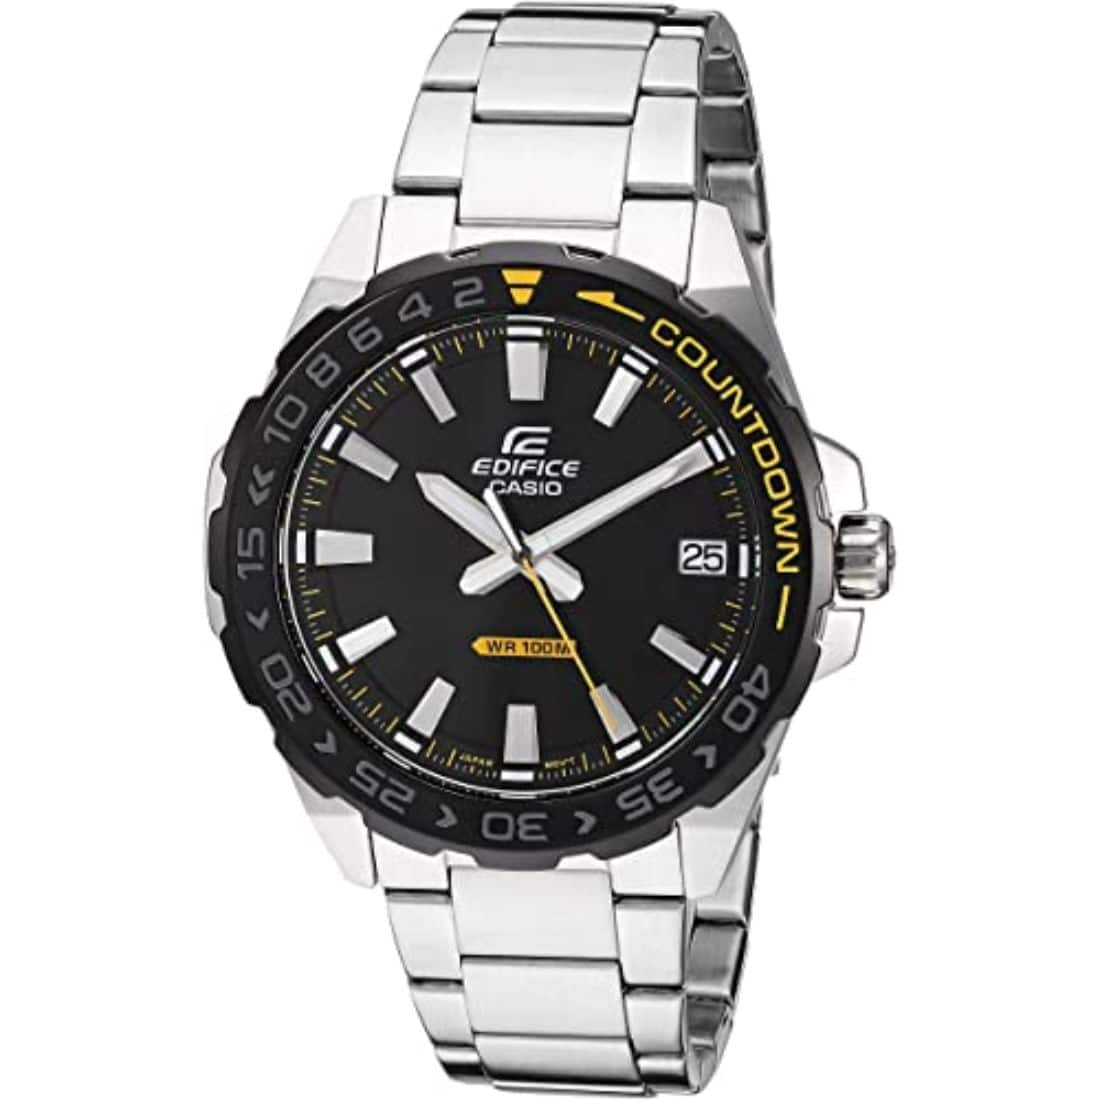 Casio Men's Edifice Stainless Steel Watch EFV120DB-1AV $26.49